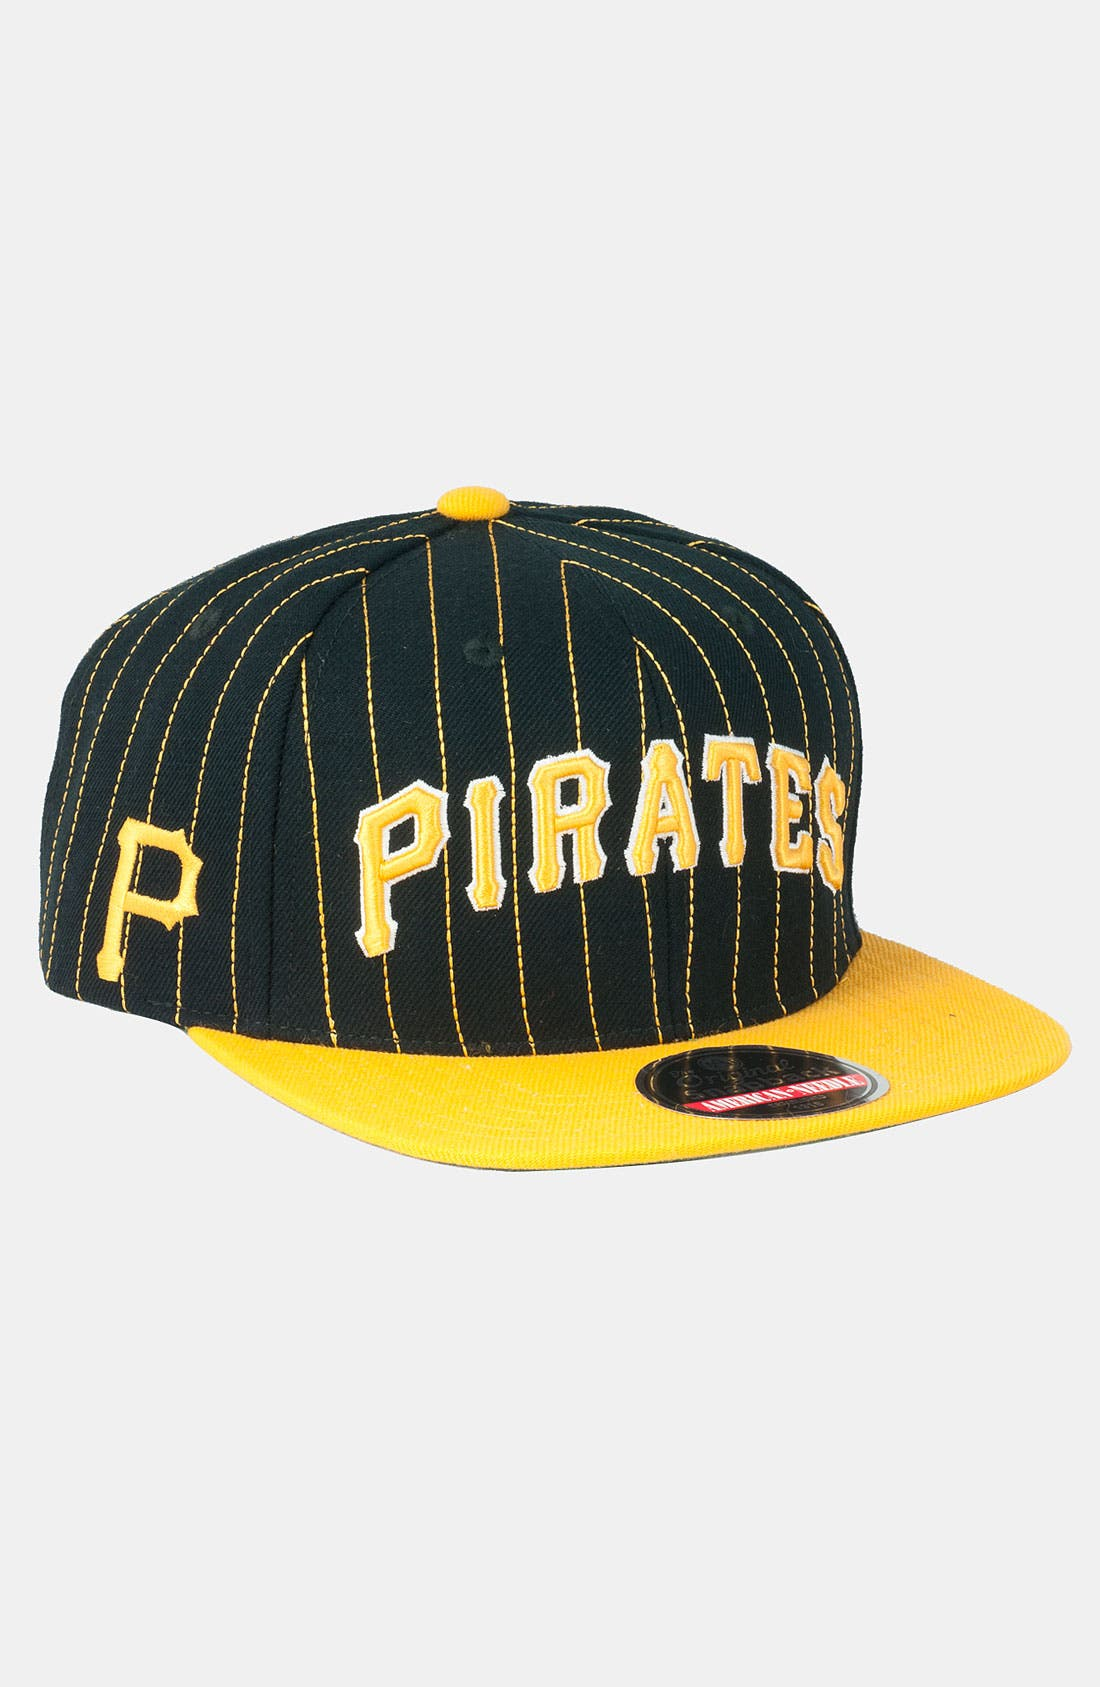 Alternate Image 1 Selected - American Needle 'Pirates' Snapback Baseball Cap